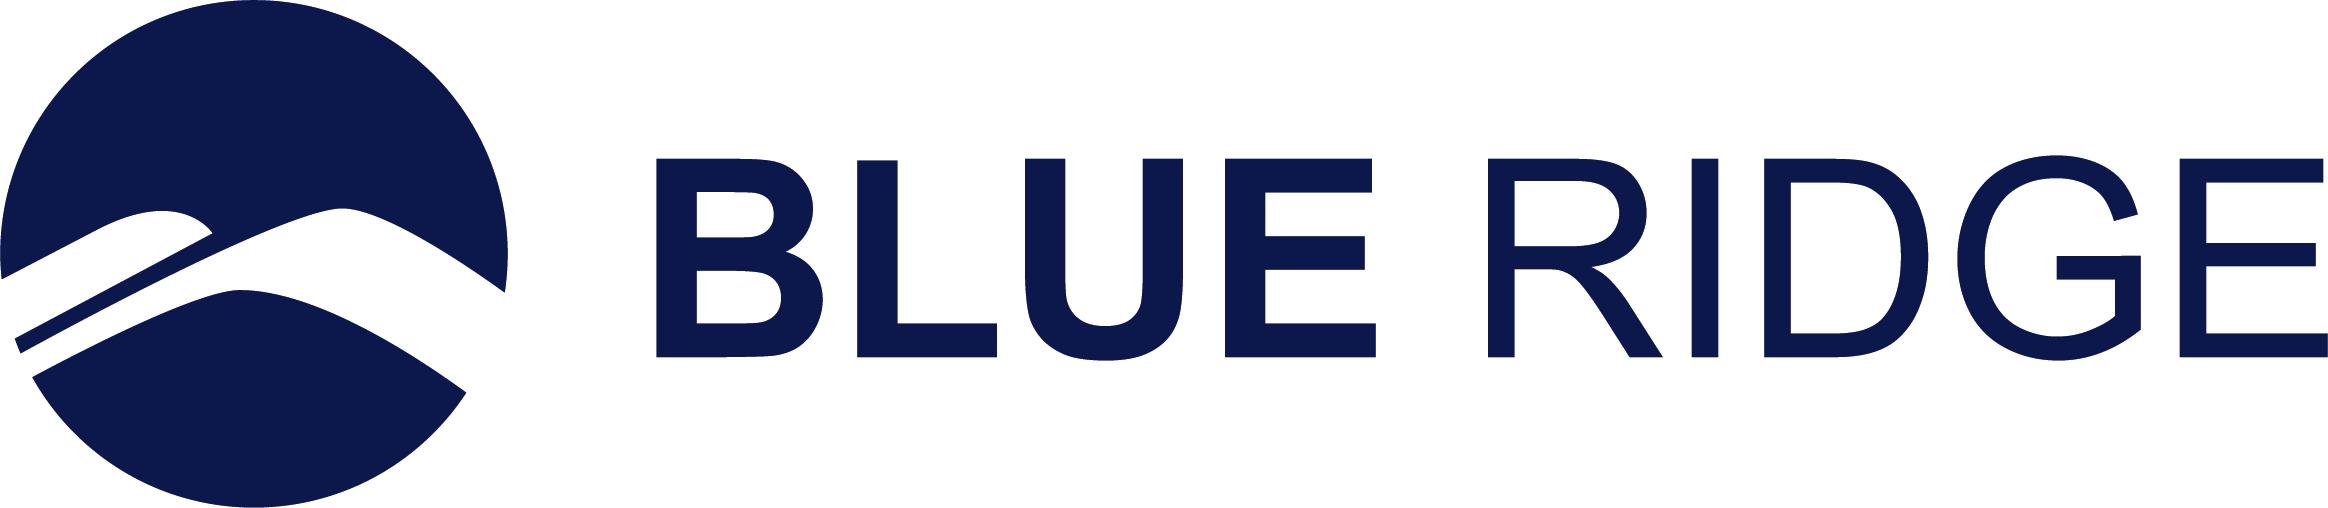 Optimizing Logistics Focus by David Cahn of Blue Ridge